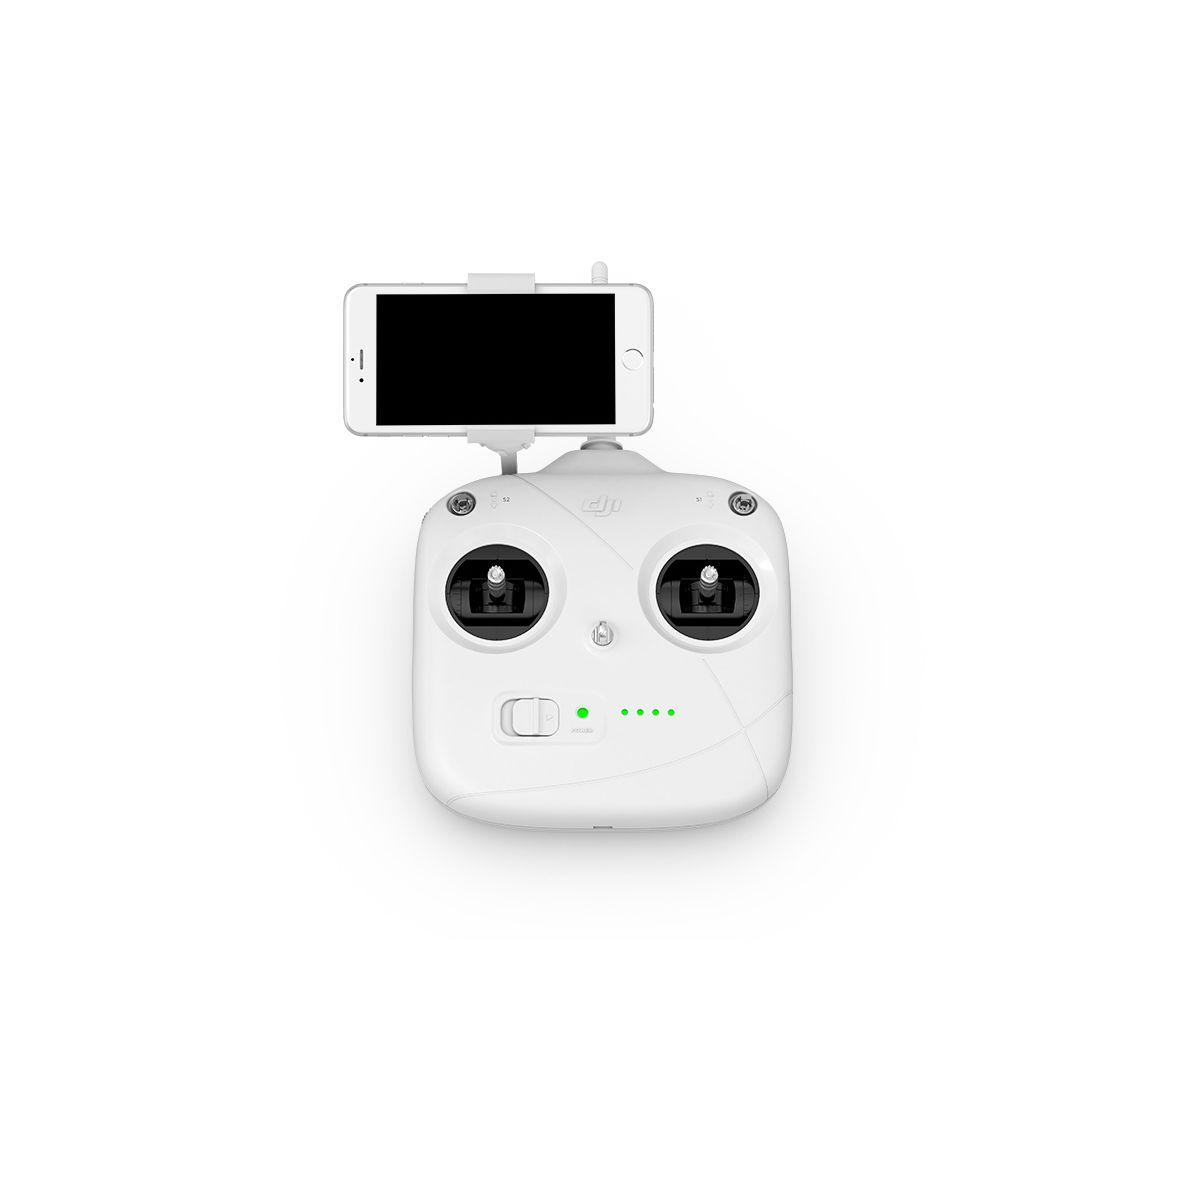 Drone dji phantom 3 - livraison offerte : code livdomicile (photo)